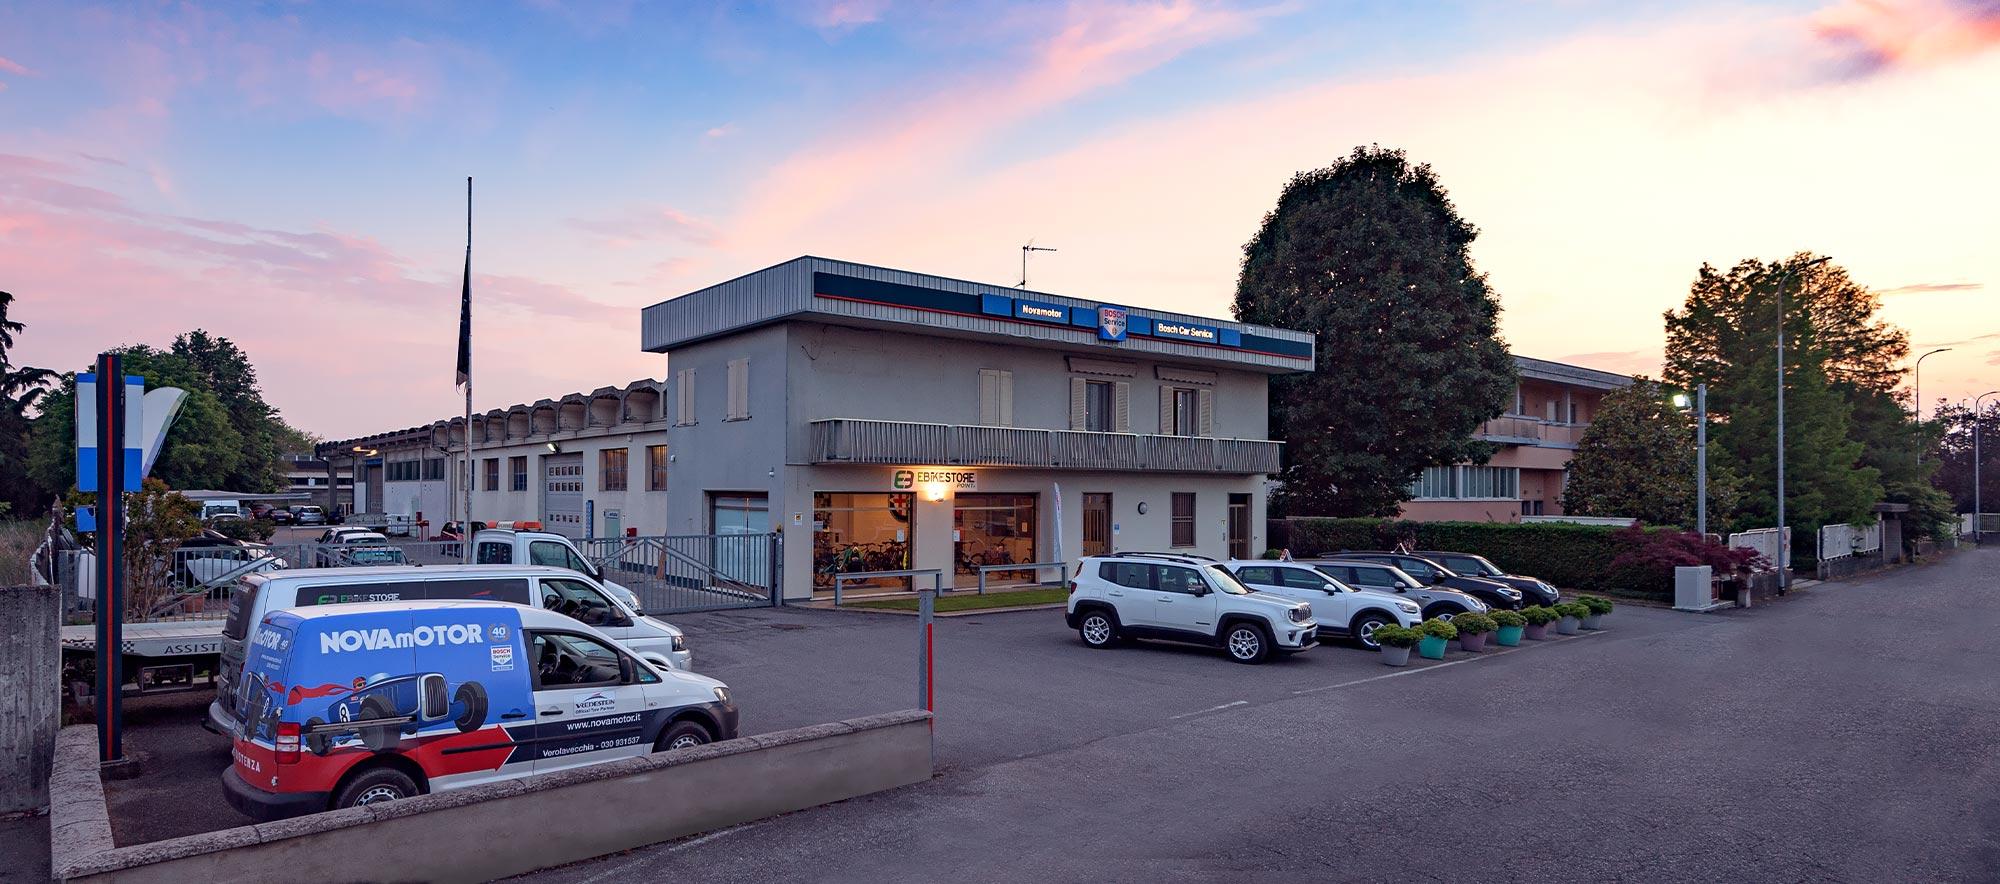 Novamotor srl Verolavecchia Brescia